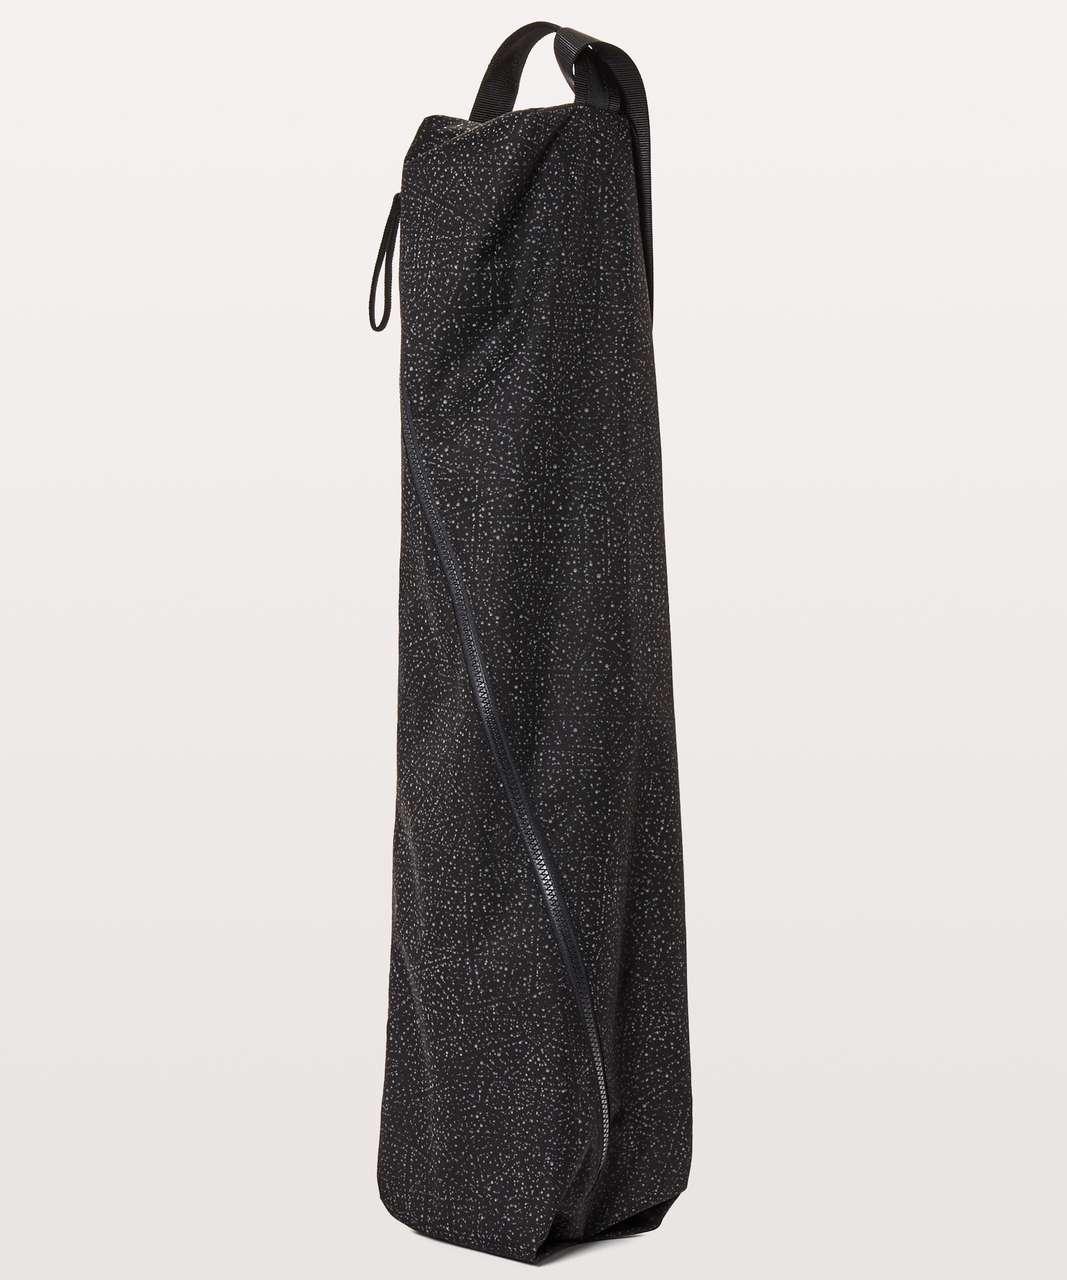 Lululemon The Yoga Bag Reflective 14L - Night View White Black / Black